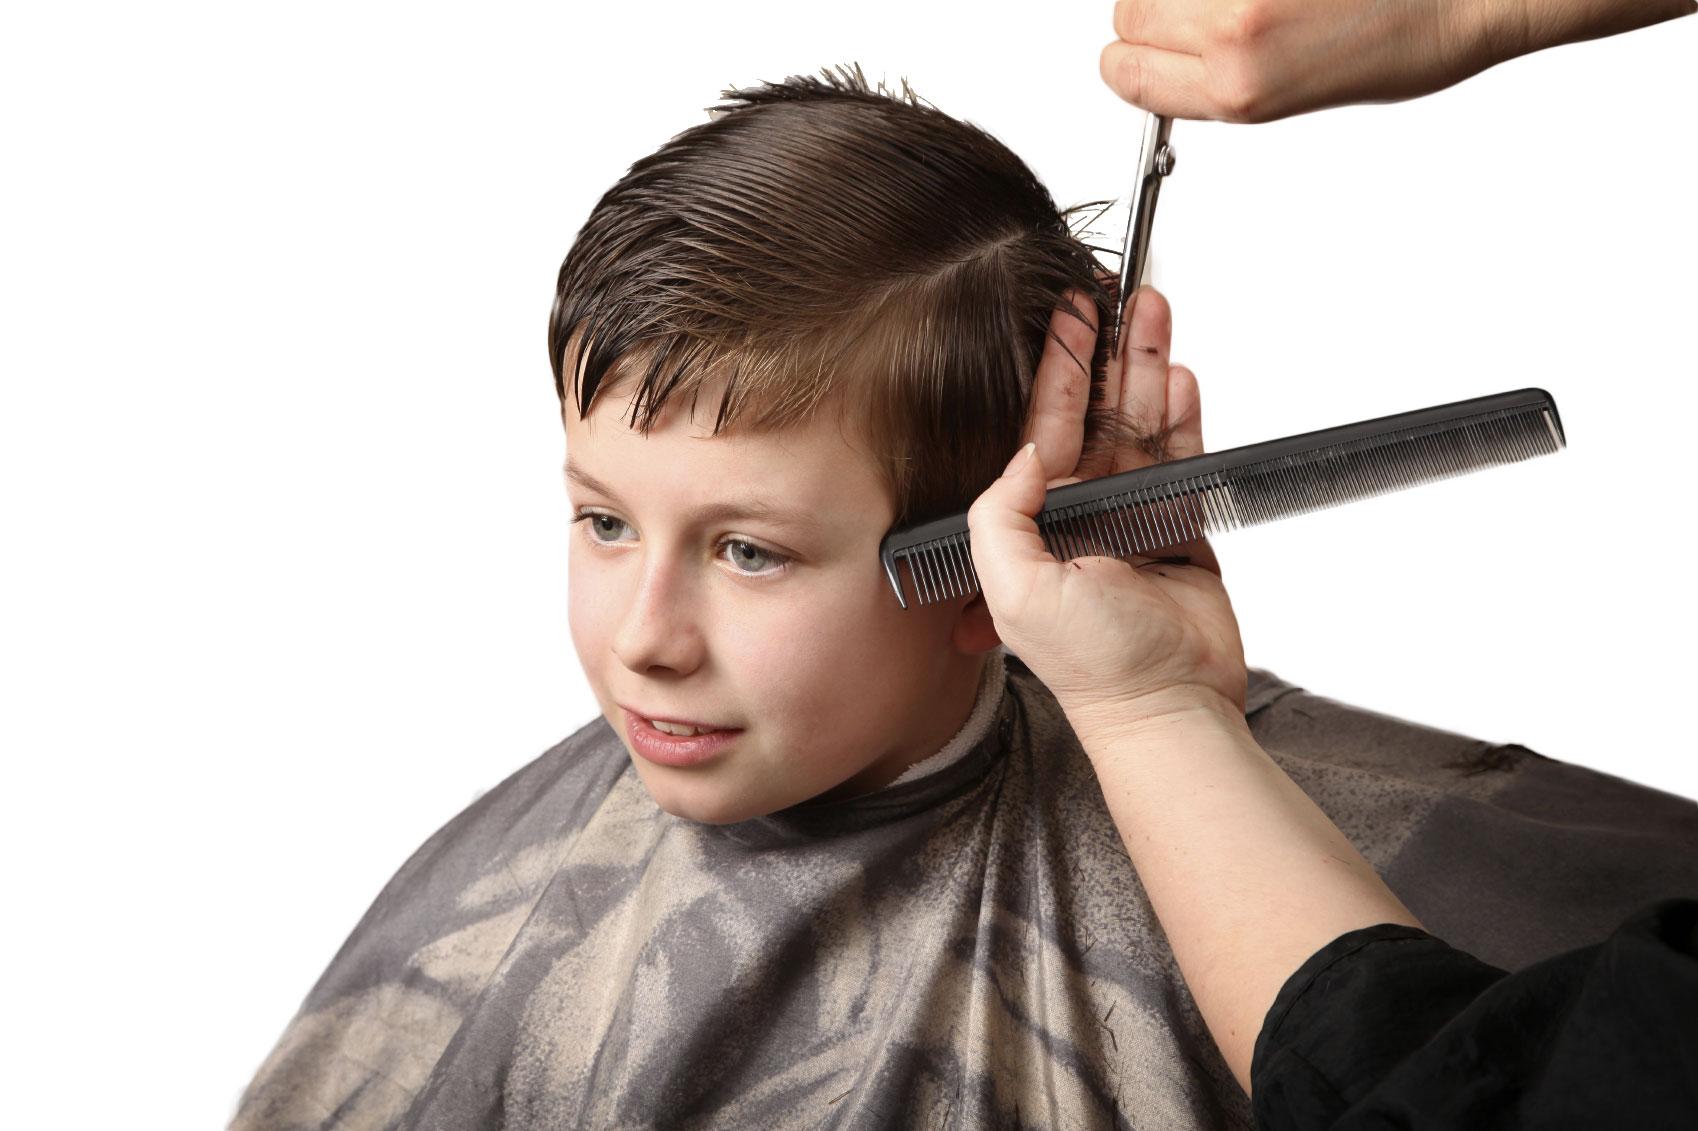 Super Hair Cut Amp Style For Him Men39S Hair Cuts Amp Salon Friendswood Texas Short Hairstyles Gunalazisus